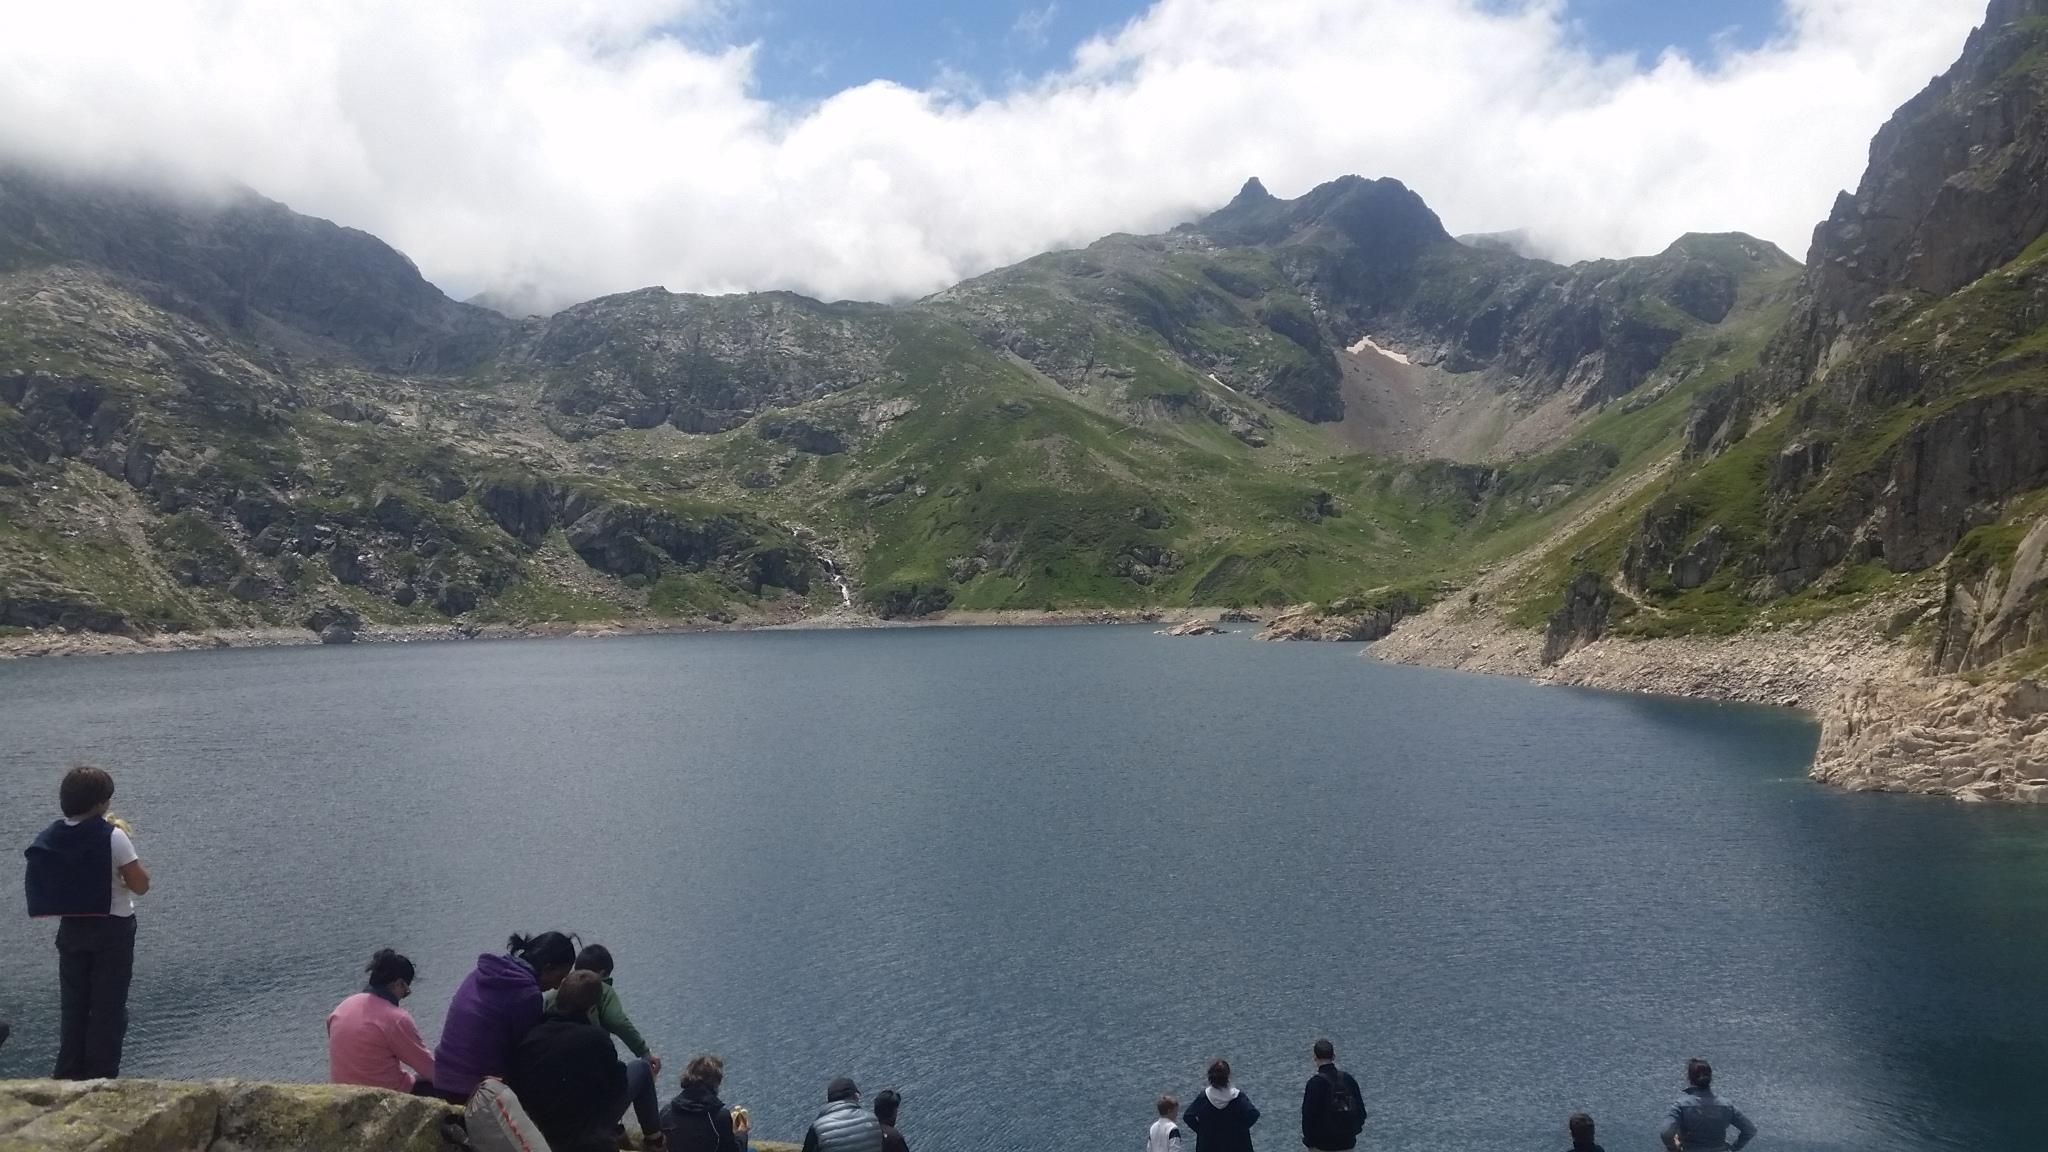 Lake of Artouste